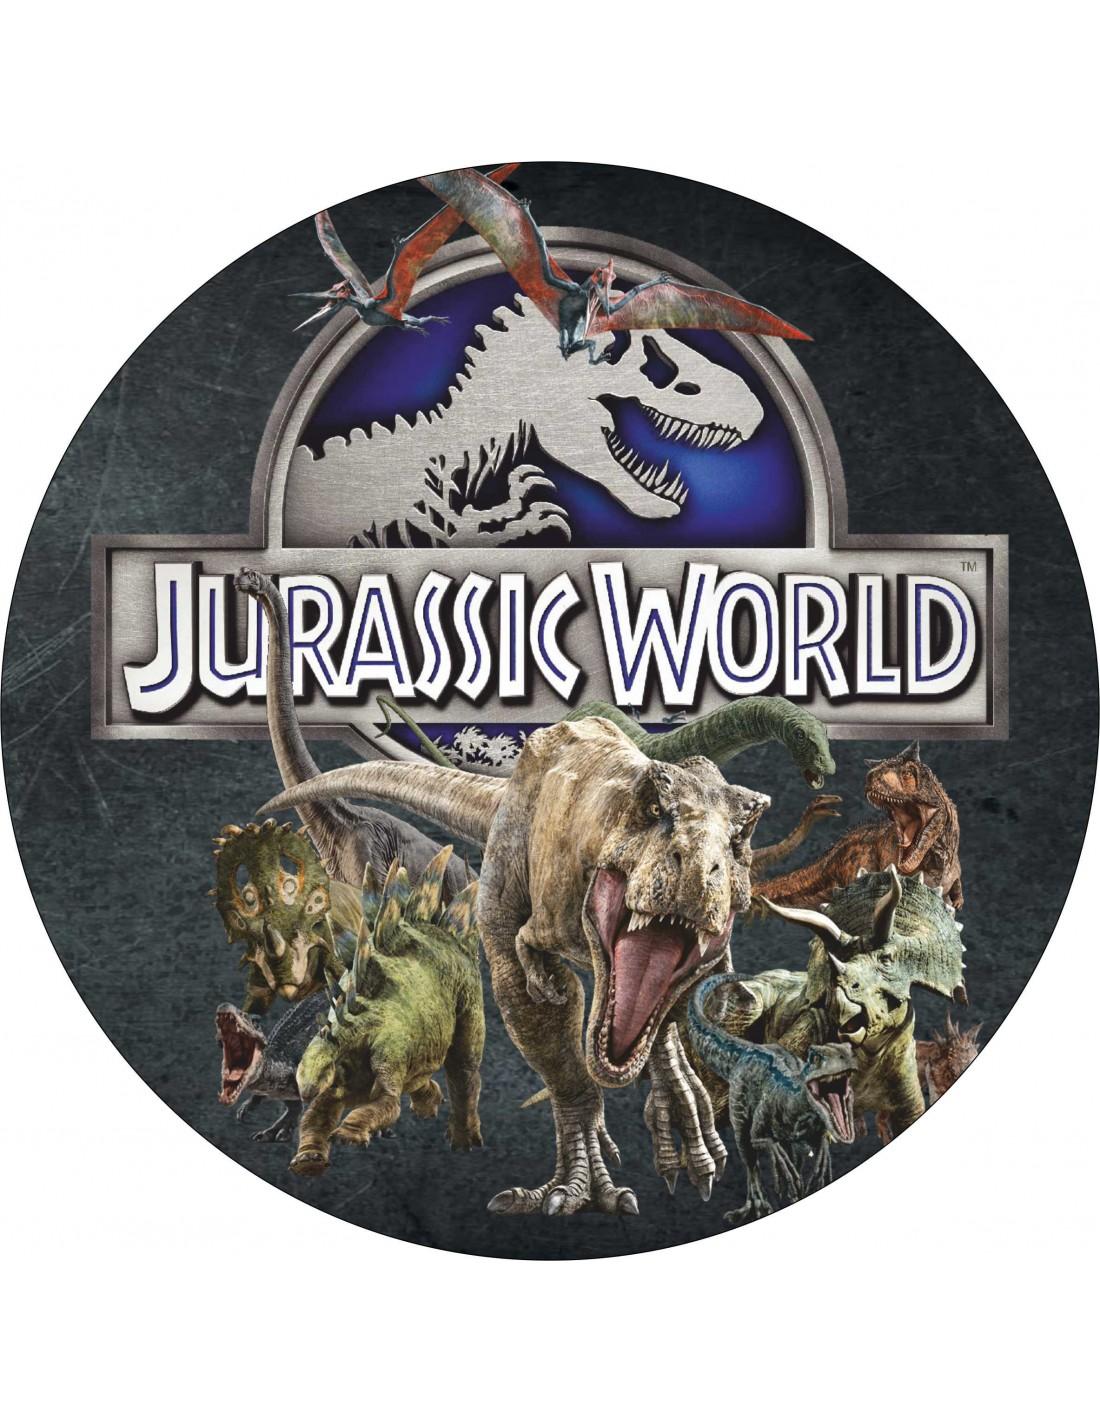 Comprar Online Papel De Azucar Jurassic World Todas las noticias sobre dinosaurios publicadas en el país. comprar online papel de azucar jurassic world